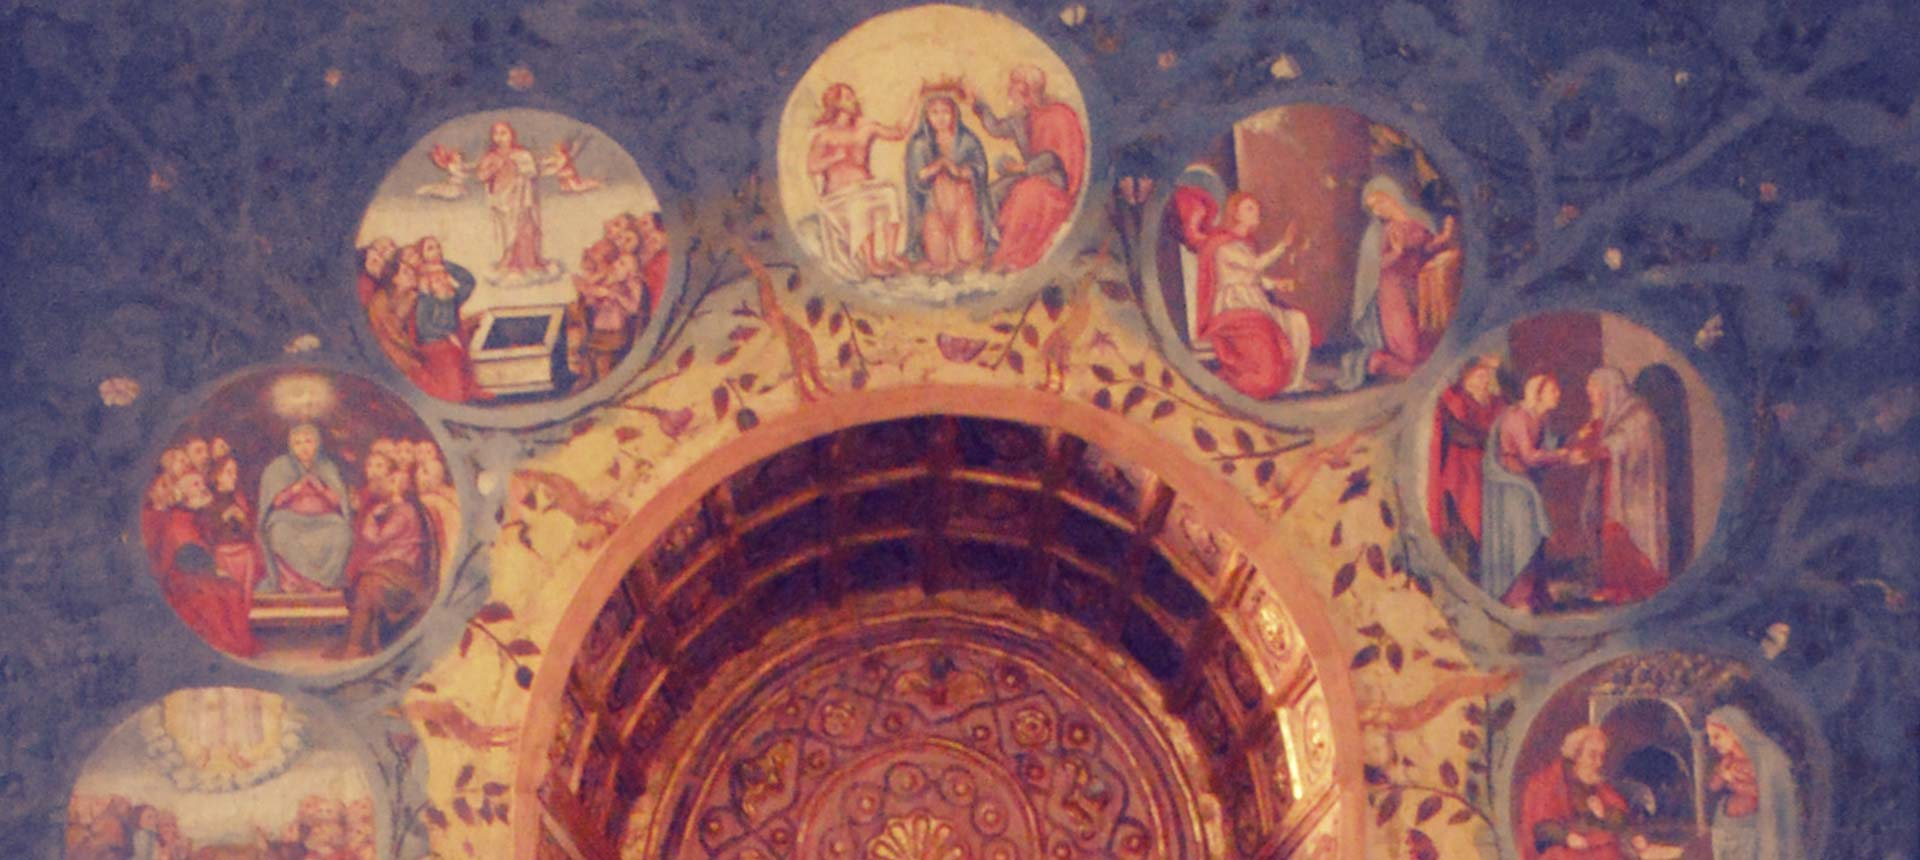 terrapinta-altare-ligneo